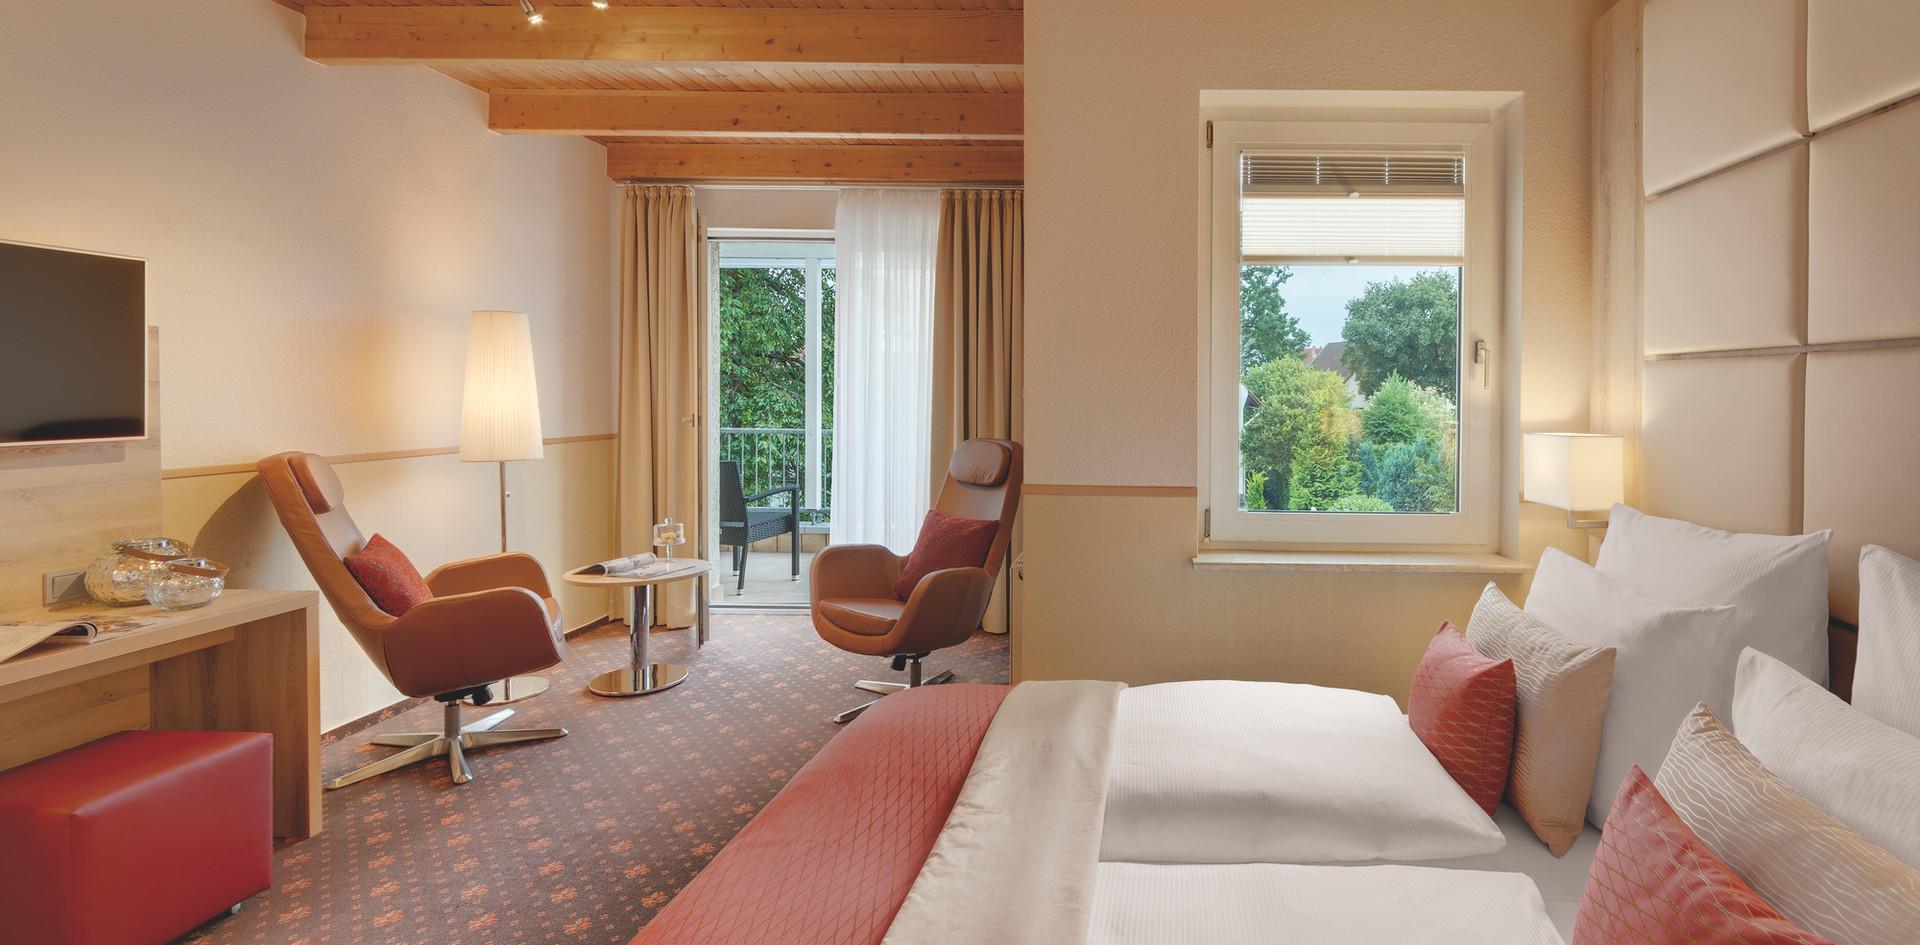 DZ Villa 1 + Balkon Hotel Wegner - The culinary Art Hotel